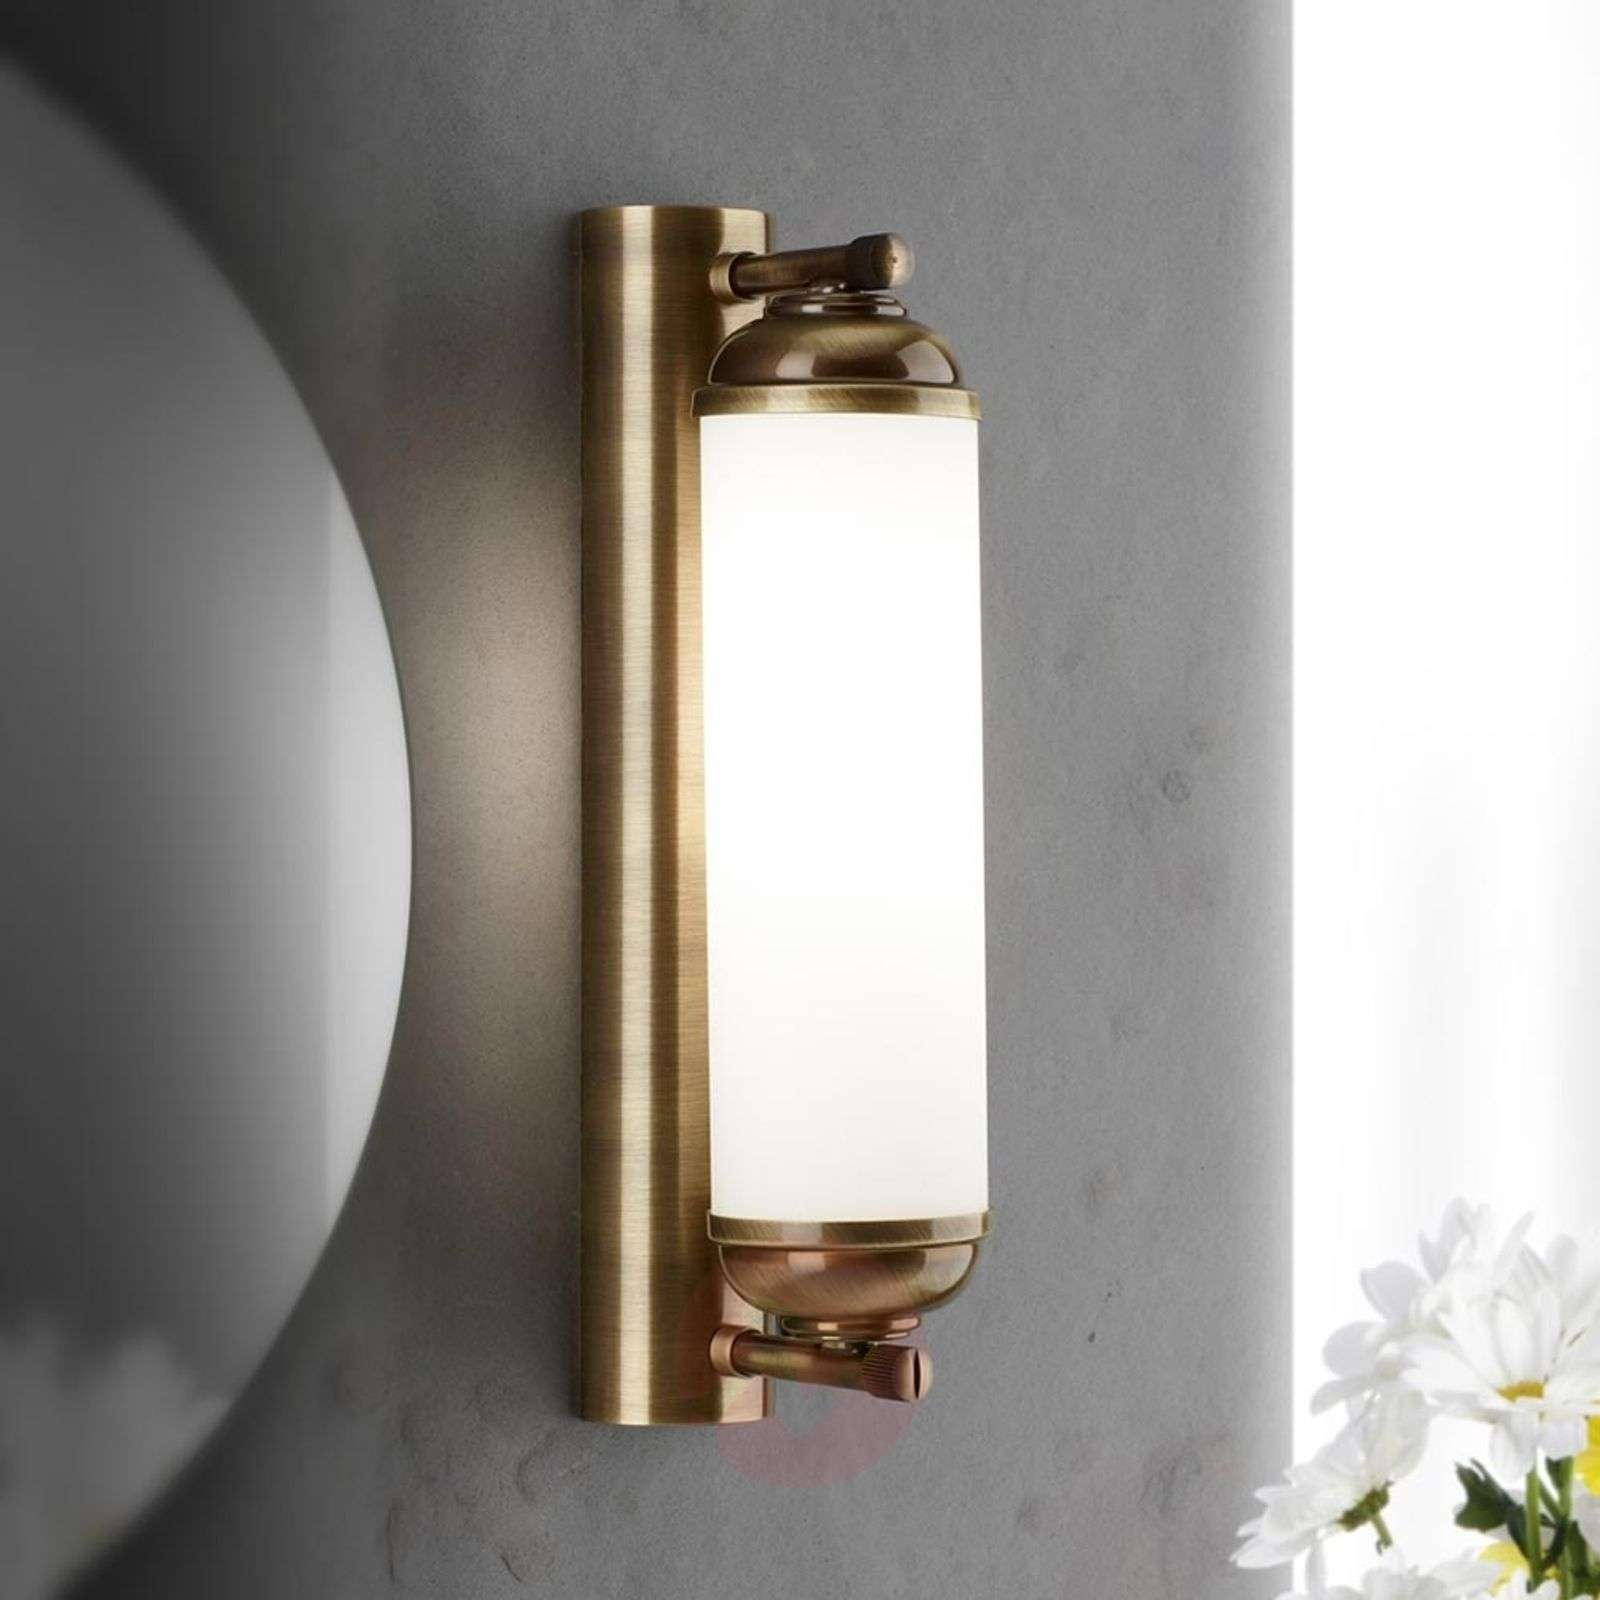 Elida Wall Light High-Quality Single Bulb-7254587-01